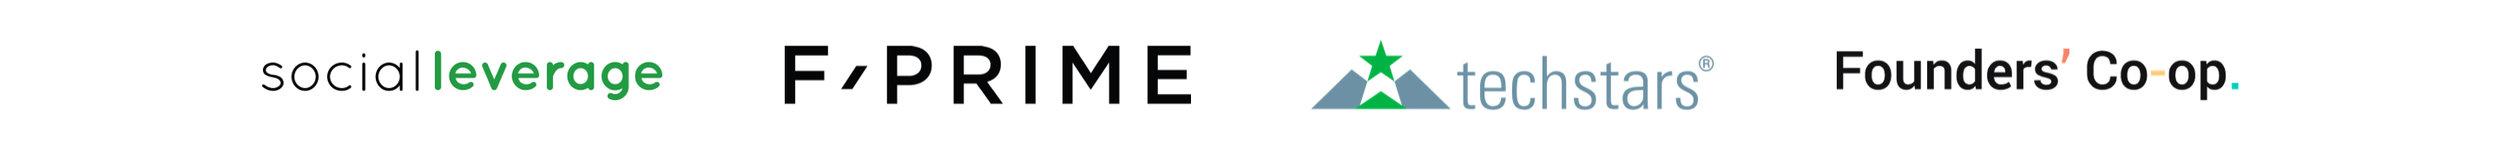 banner-investor logos-color@2x.jpg